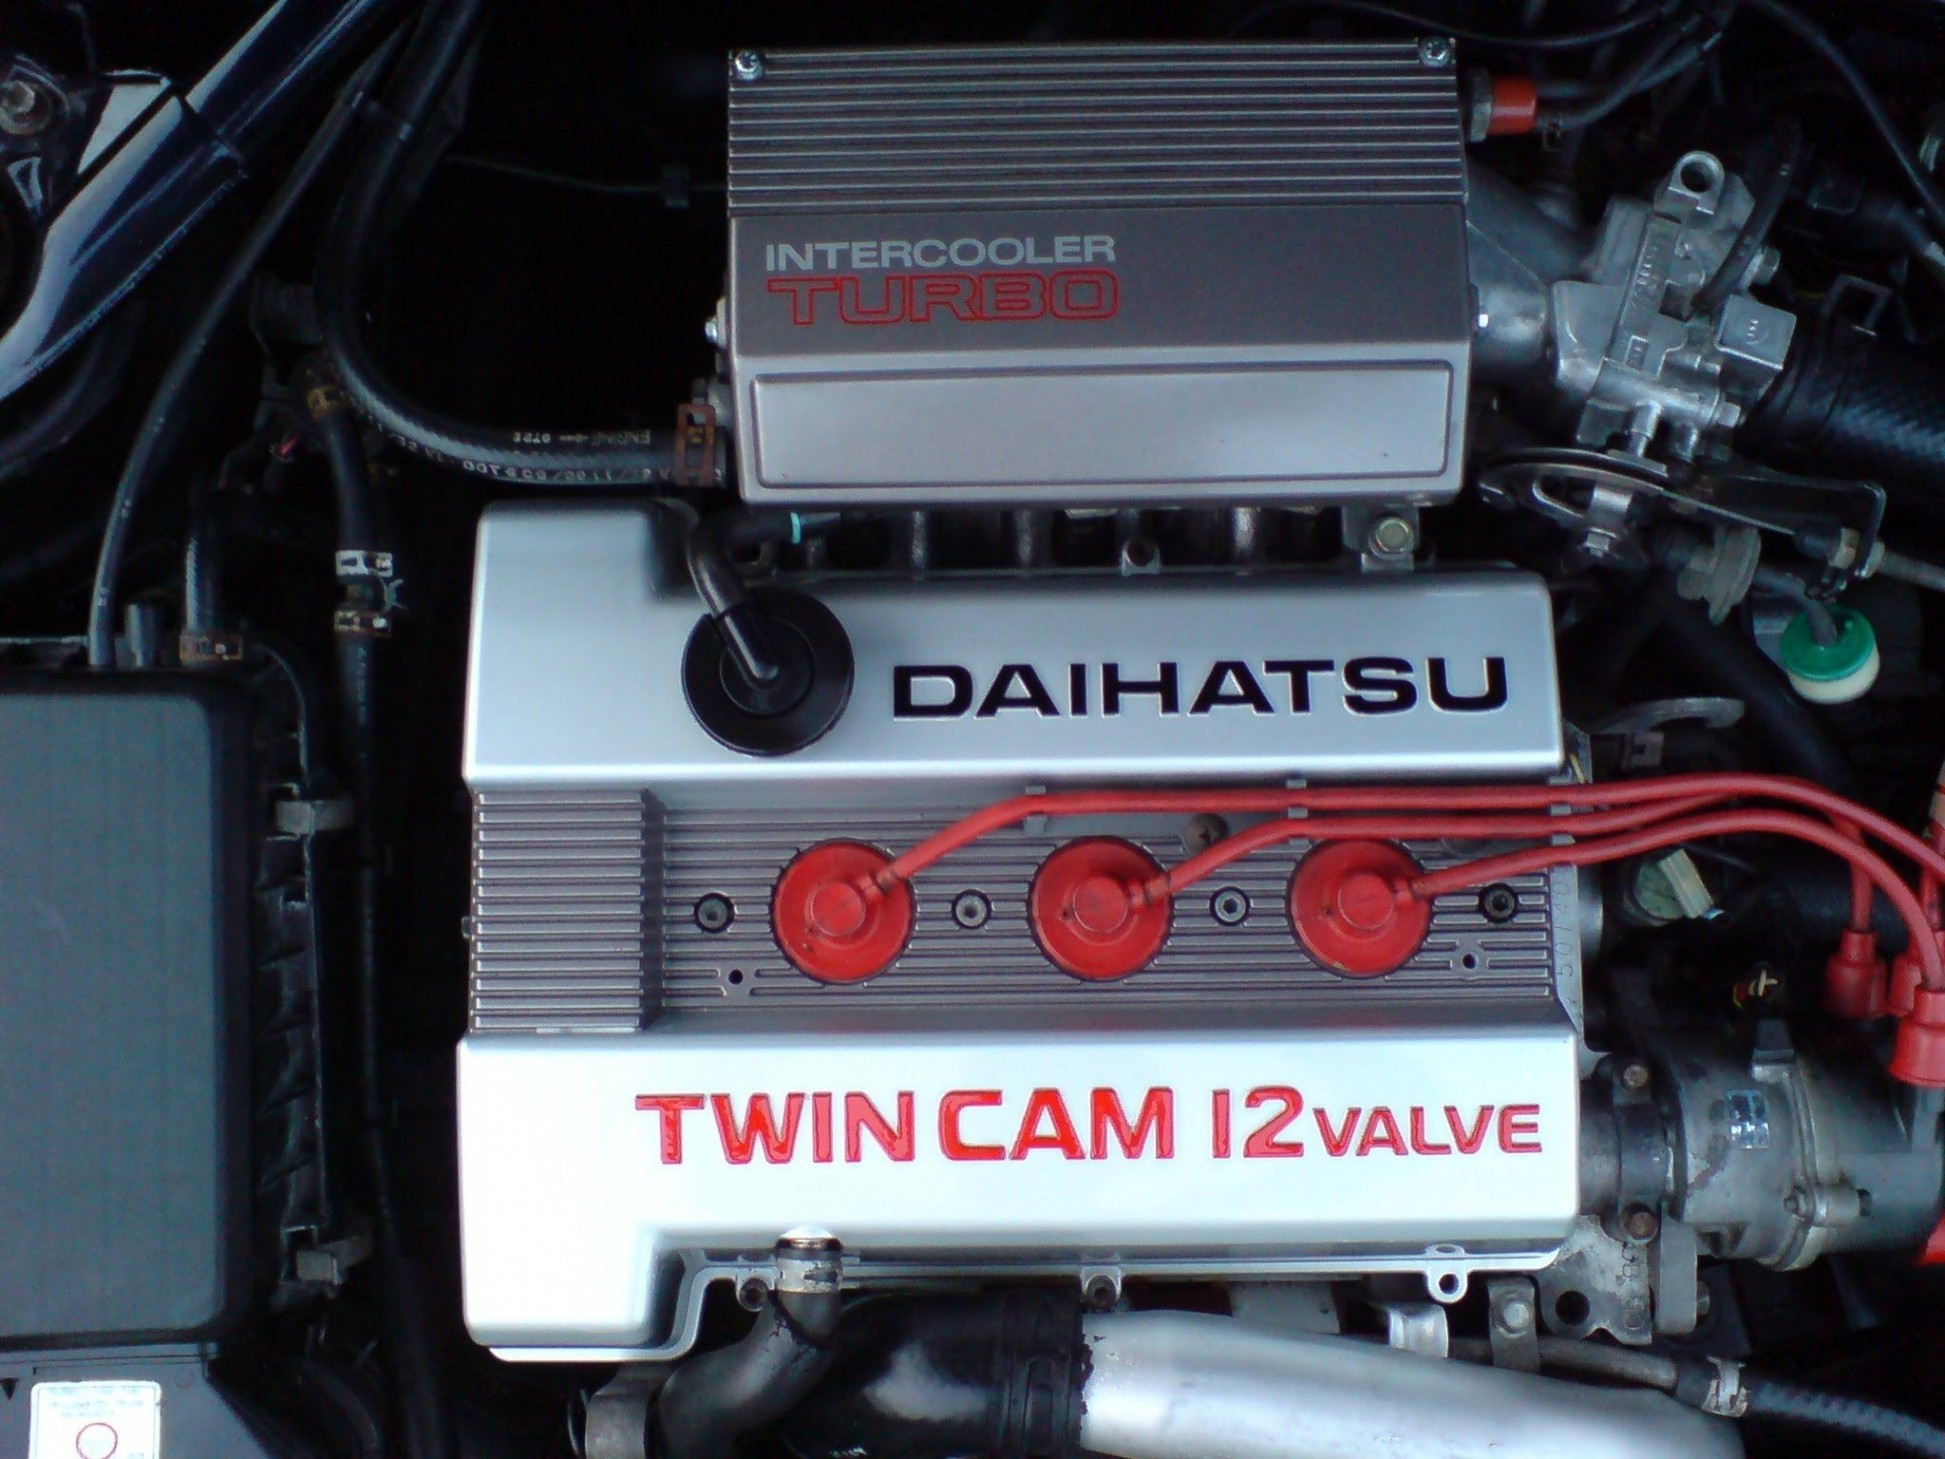 Diagram Showing Car Parts Diagram A Car – Diagram A Car New Car Parts and Diagrams Insignia Of Diagram Showing Car Parts